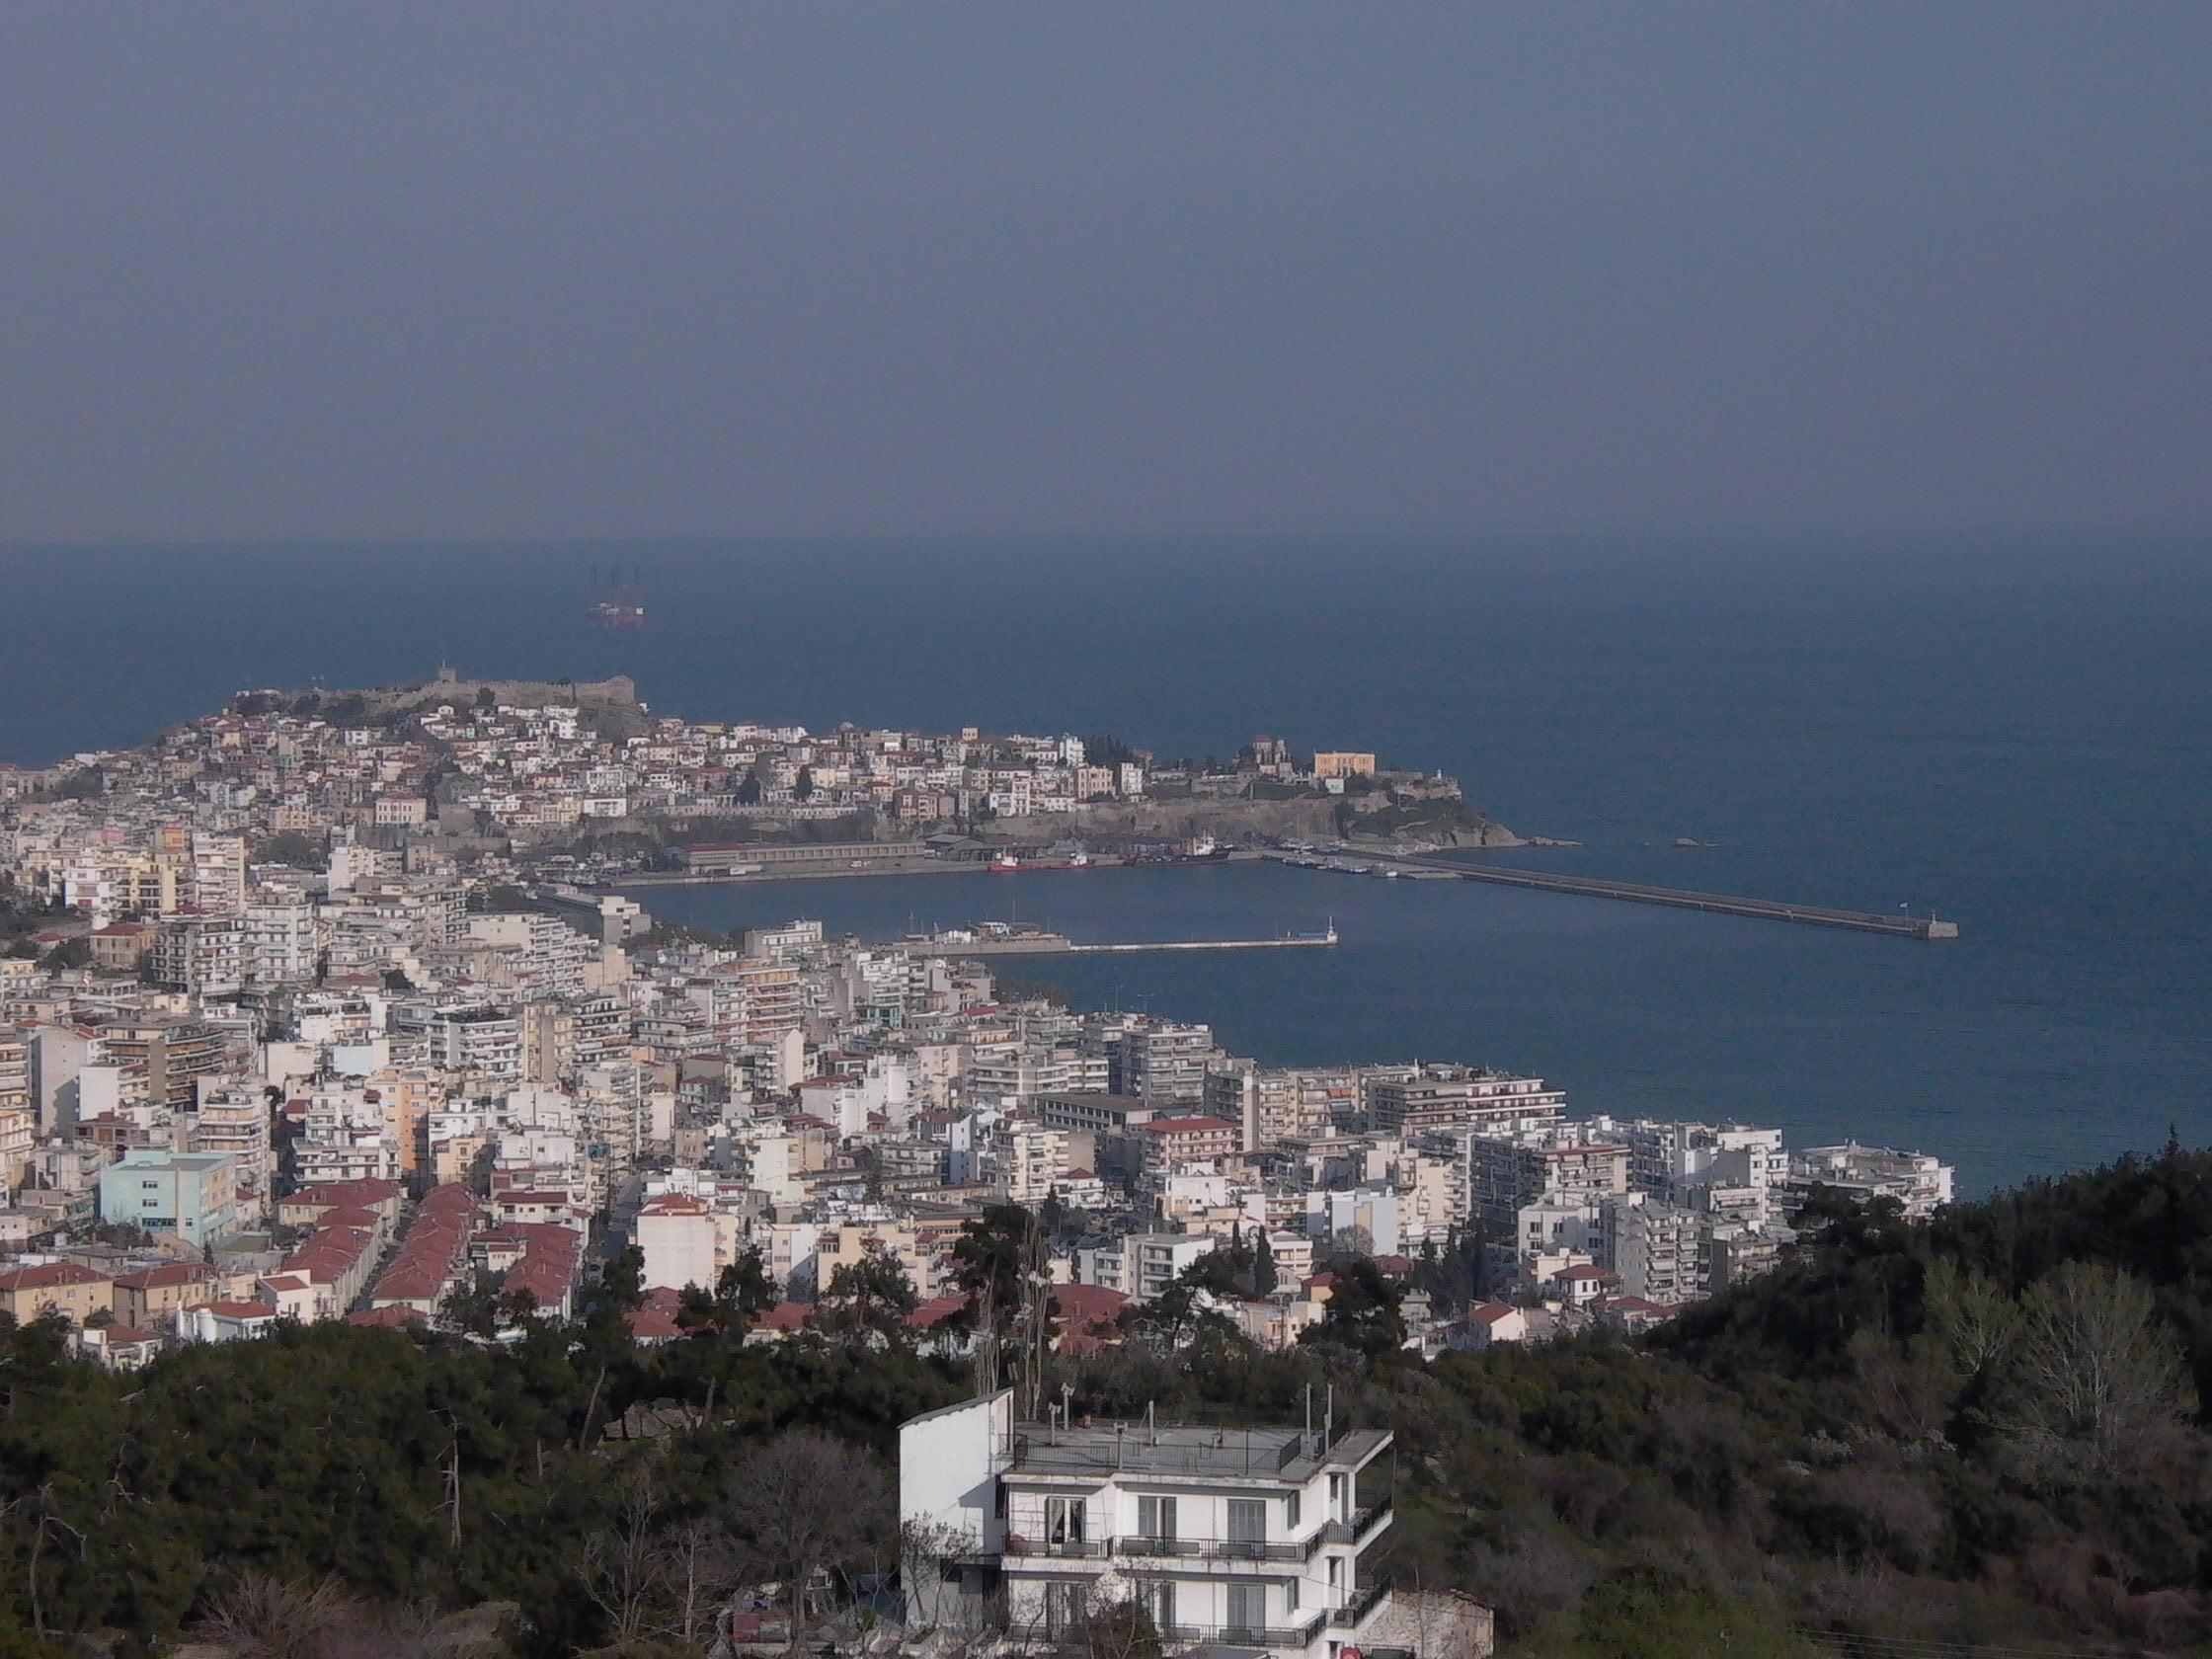 Kavala, Greece. Production platform in the background, Aegean Sea.